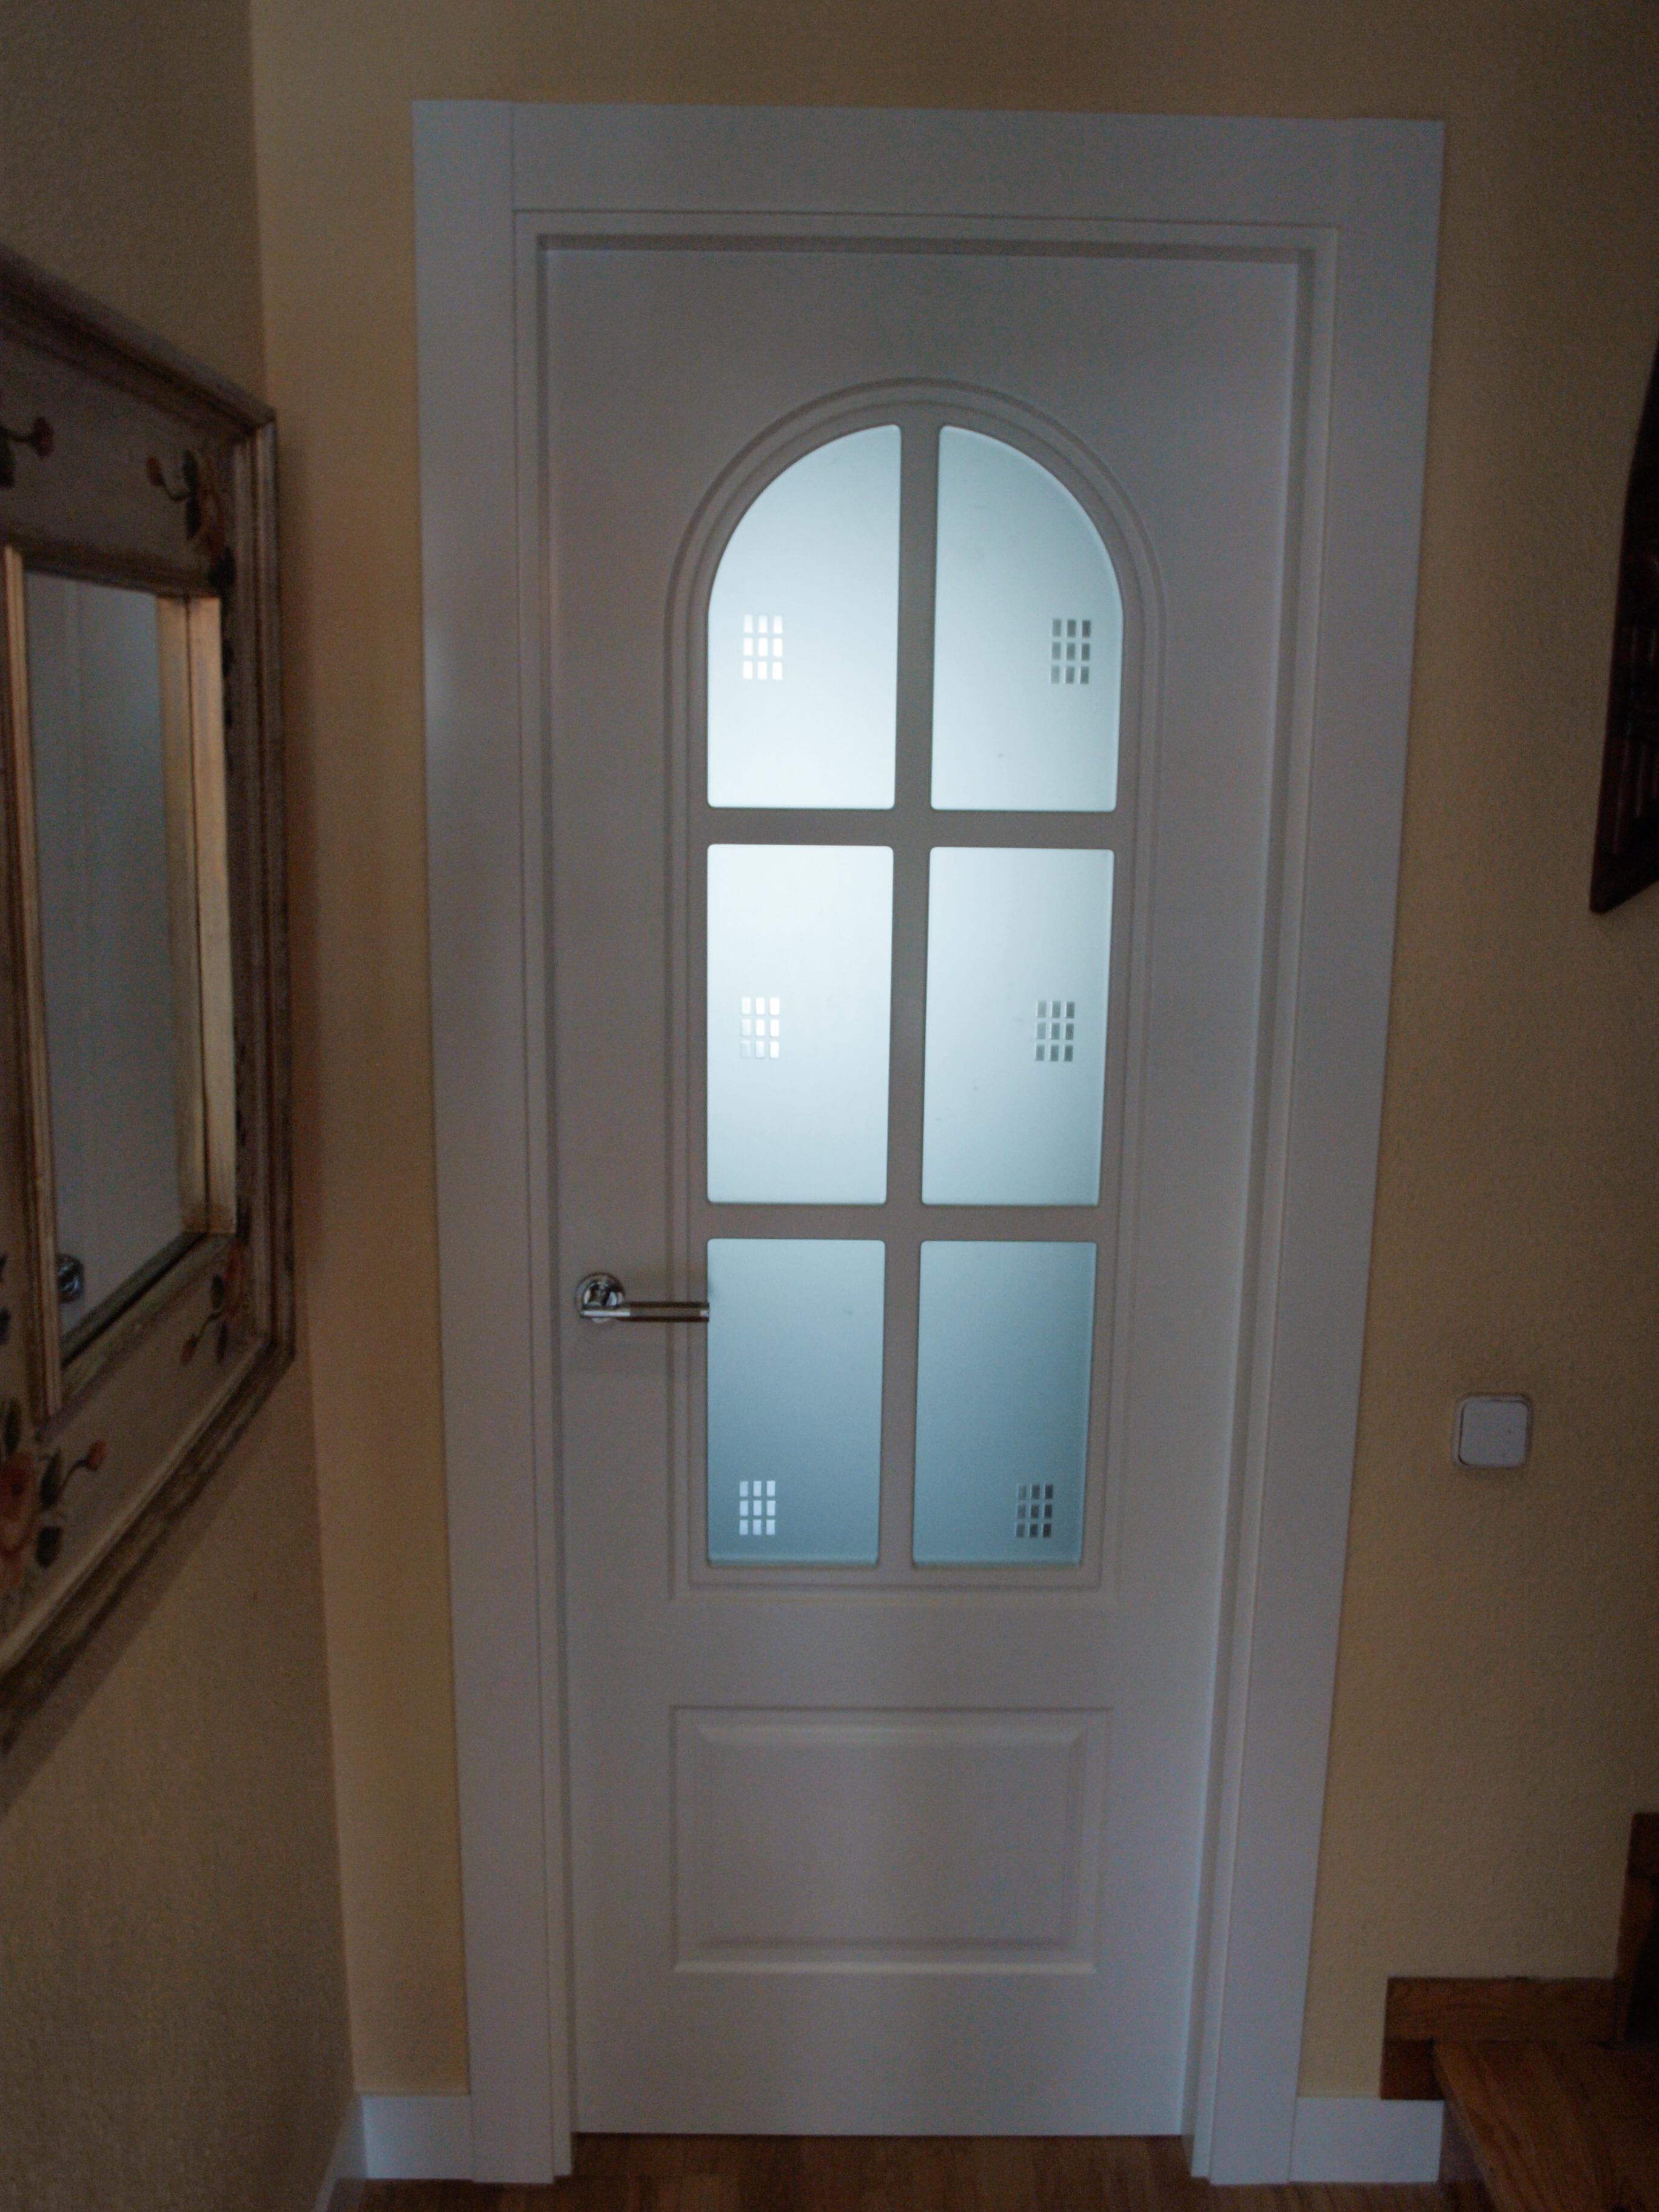 Puertas lacadas blanco cheap decora tu hogar con puertas for Casas con puertas blancas